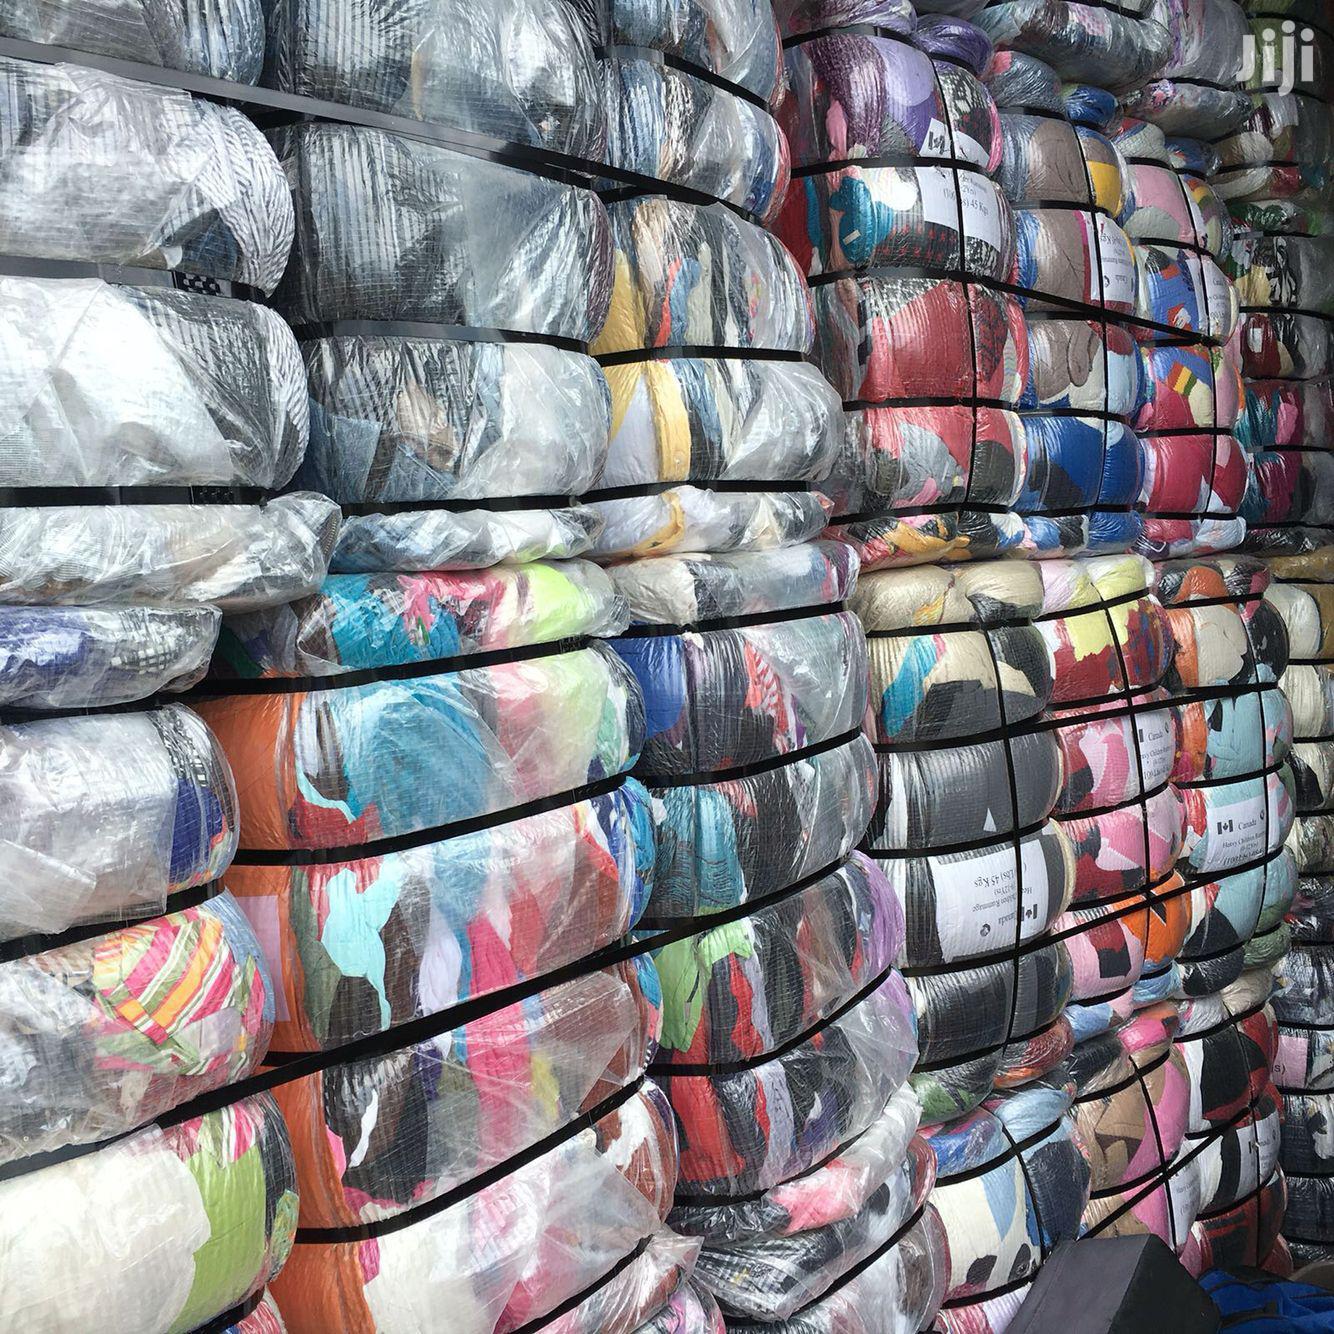 Mitumba Bales Sellers in Nairobi Central - Clothing, Emerald Supplies |  Jiji.co.ke